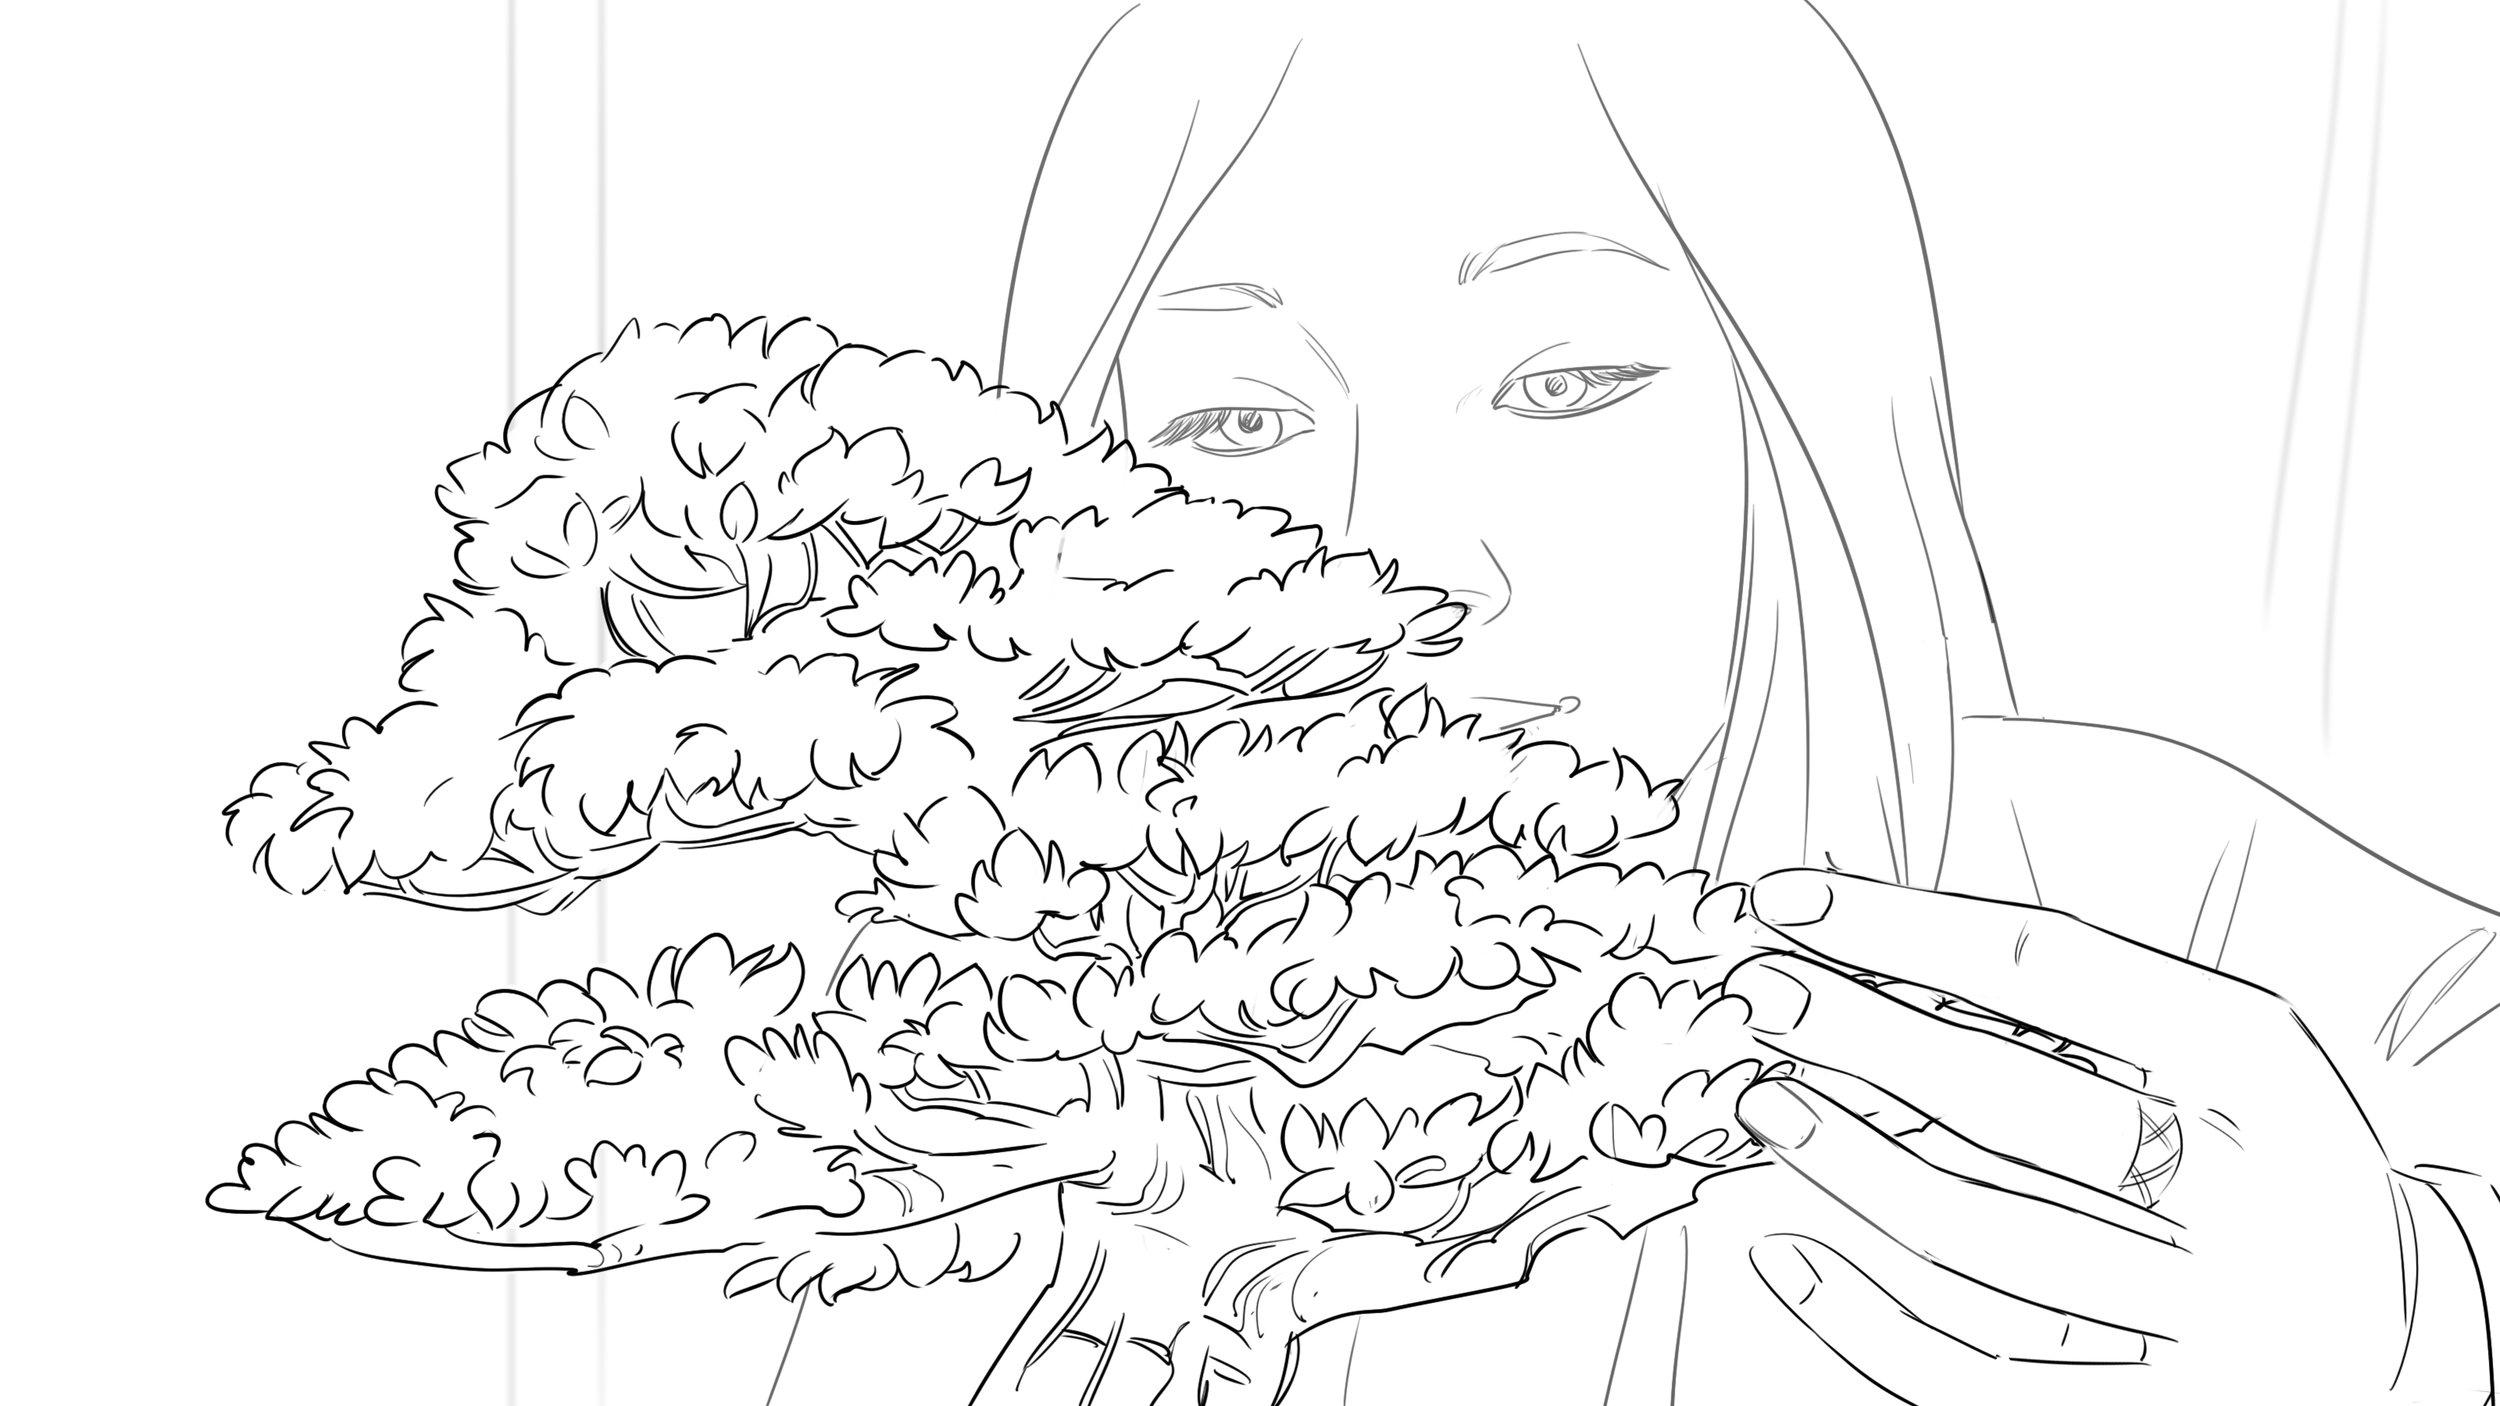 The Bonsai tree 7.1.jpg